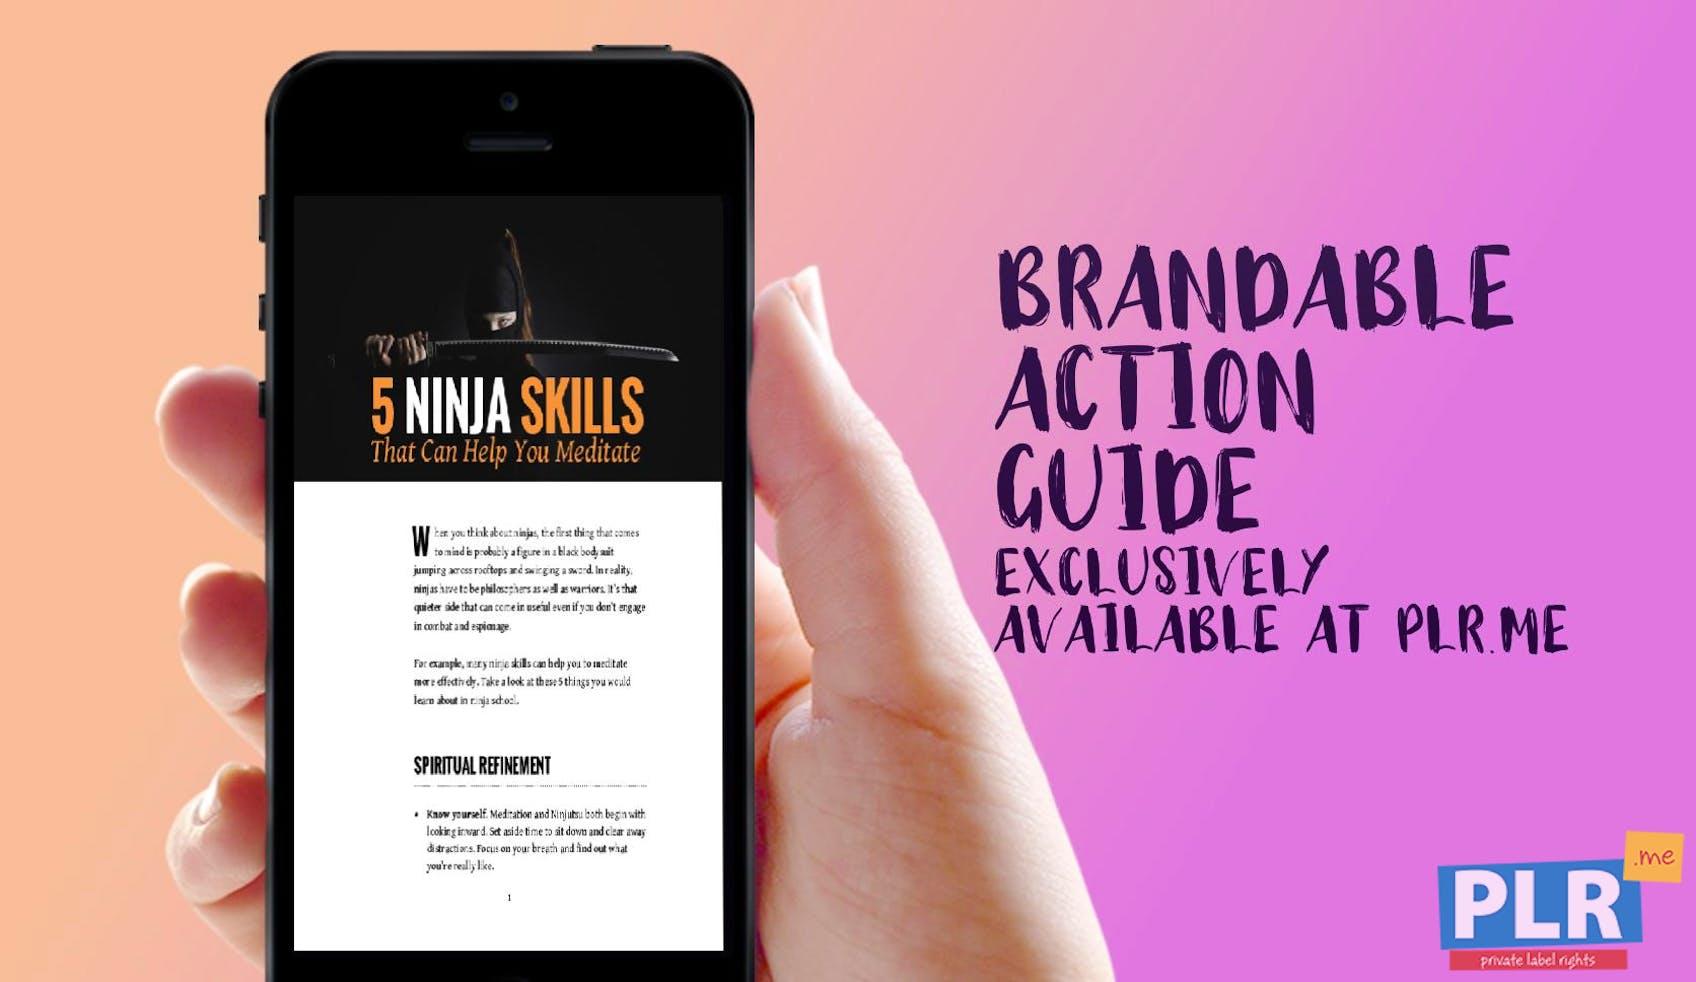 5 Ninja Skills That Can Help You Meditate